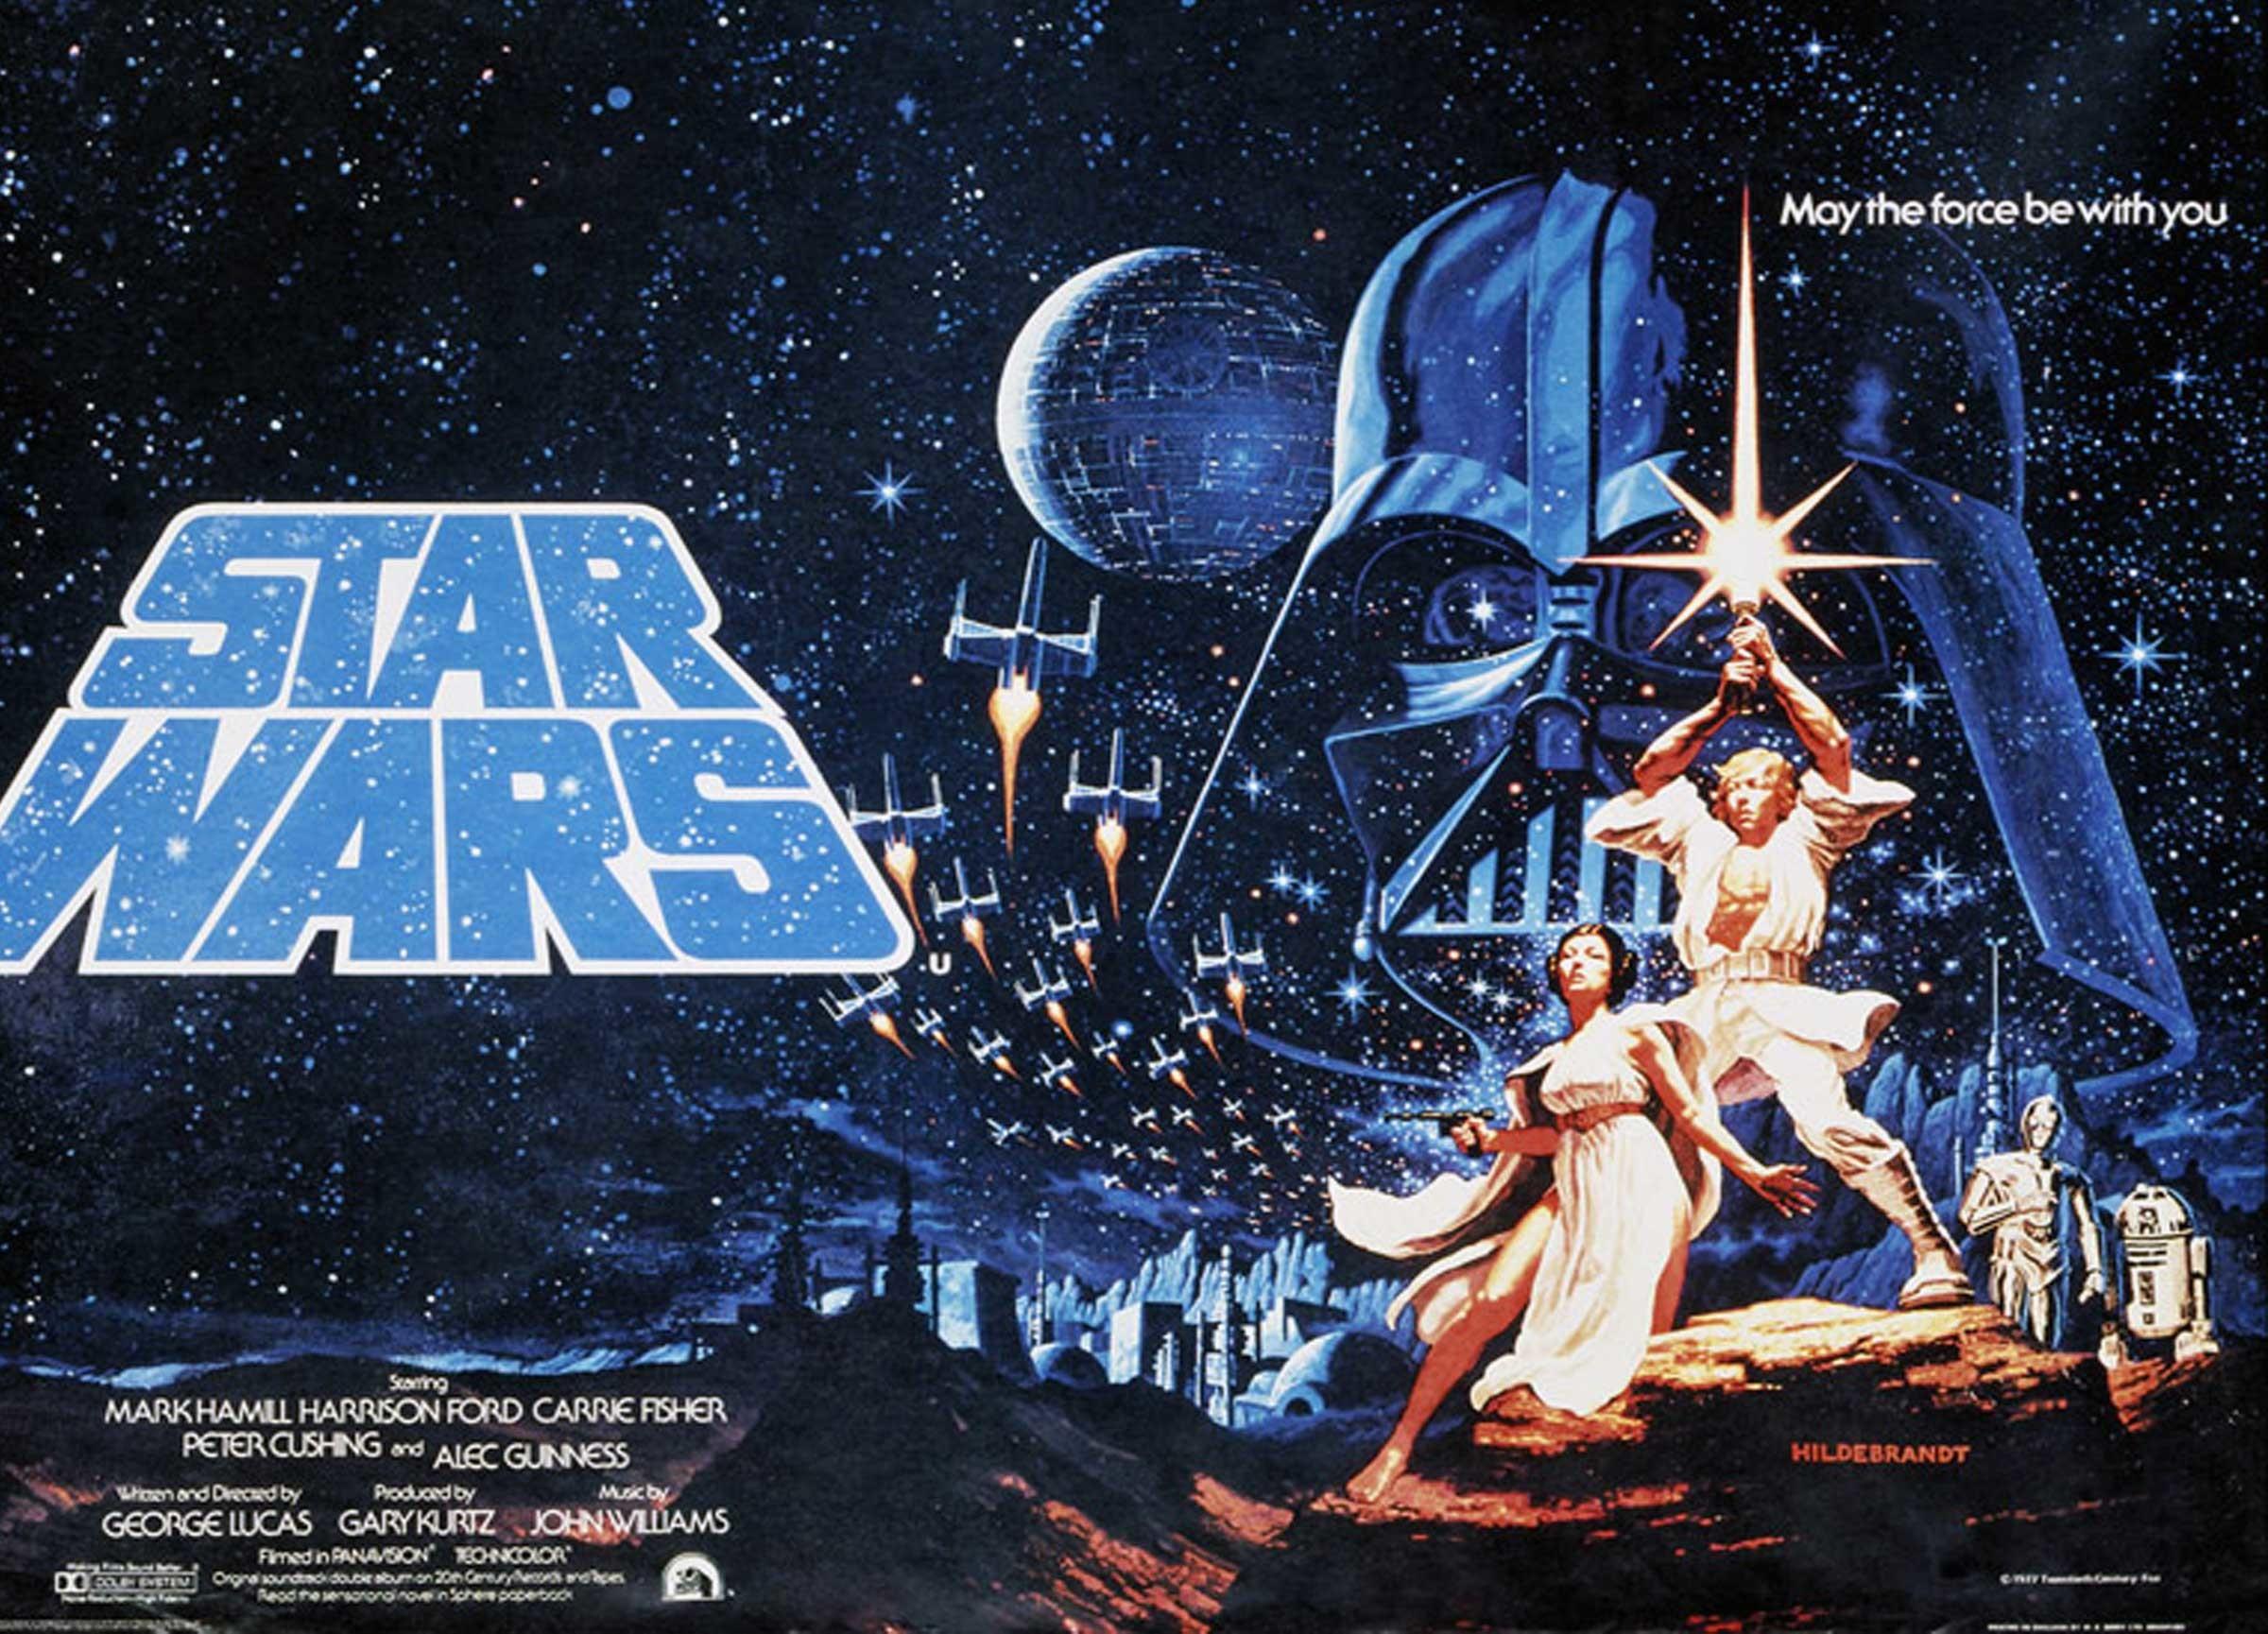 Star wars movie poster wallpaper